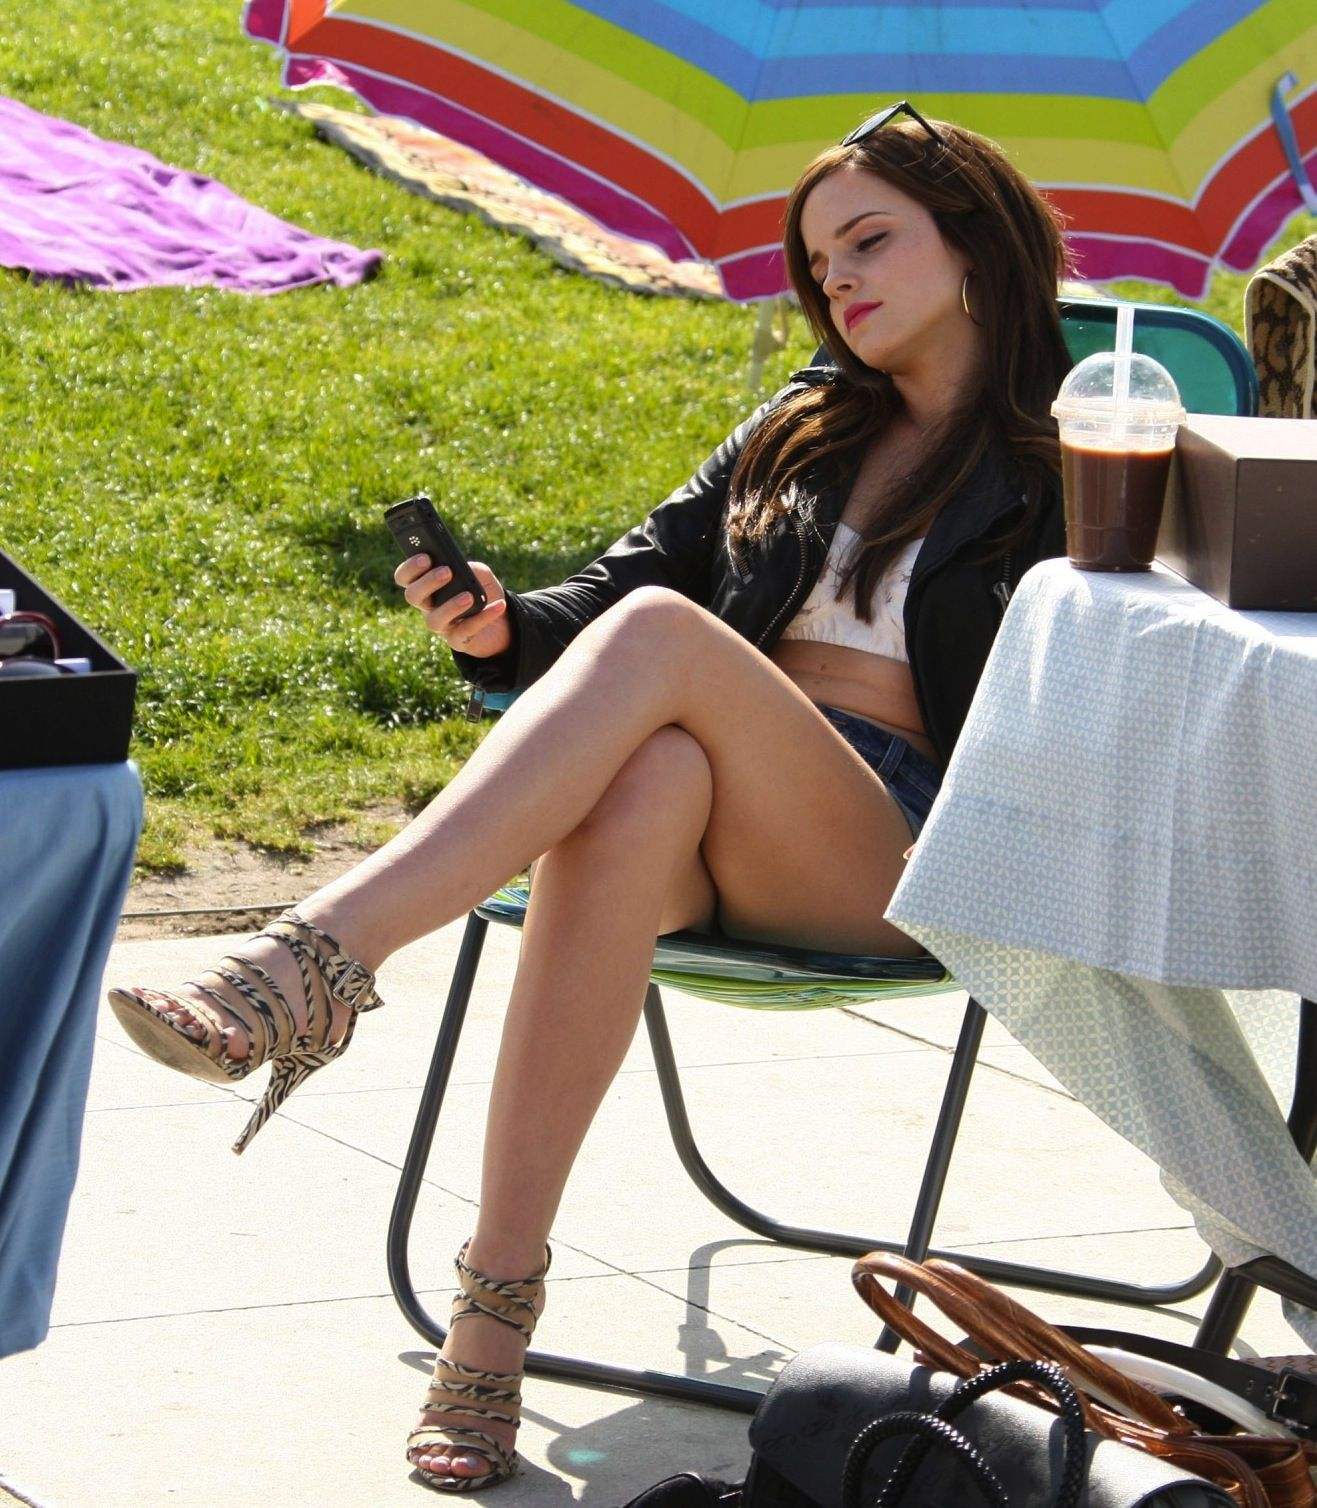 Celebrity Skin Dvd Trailer – Naked Actress Boobs - Free ...